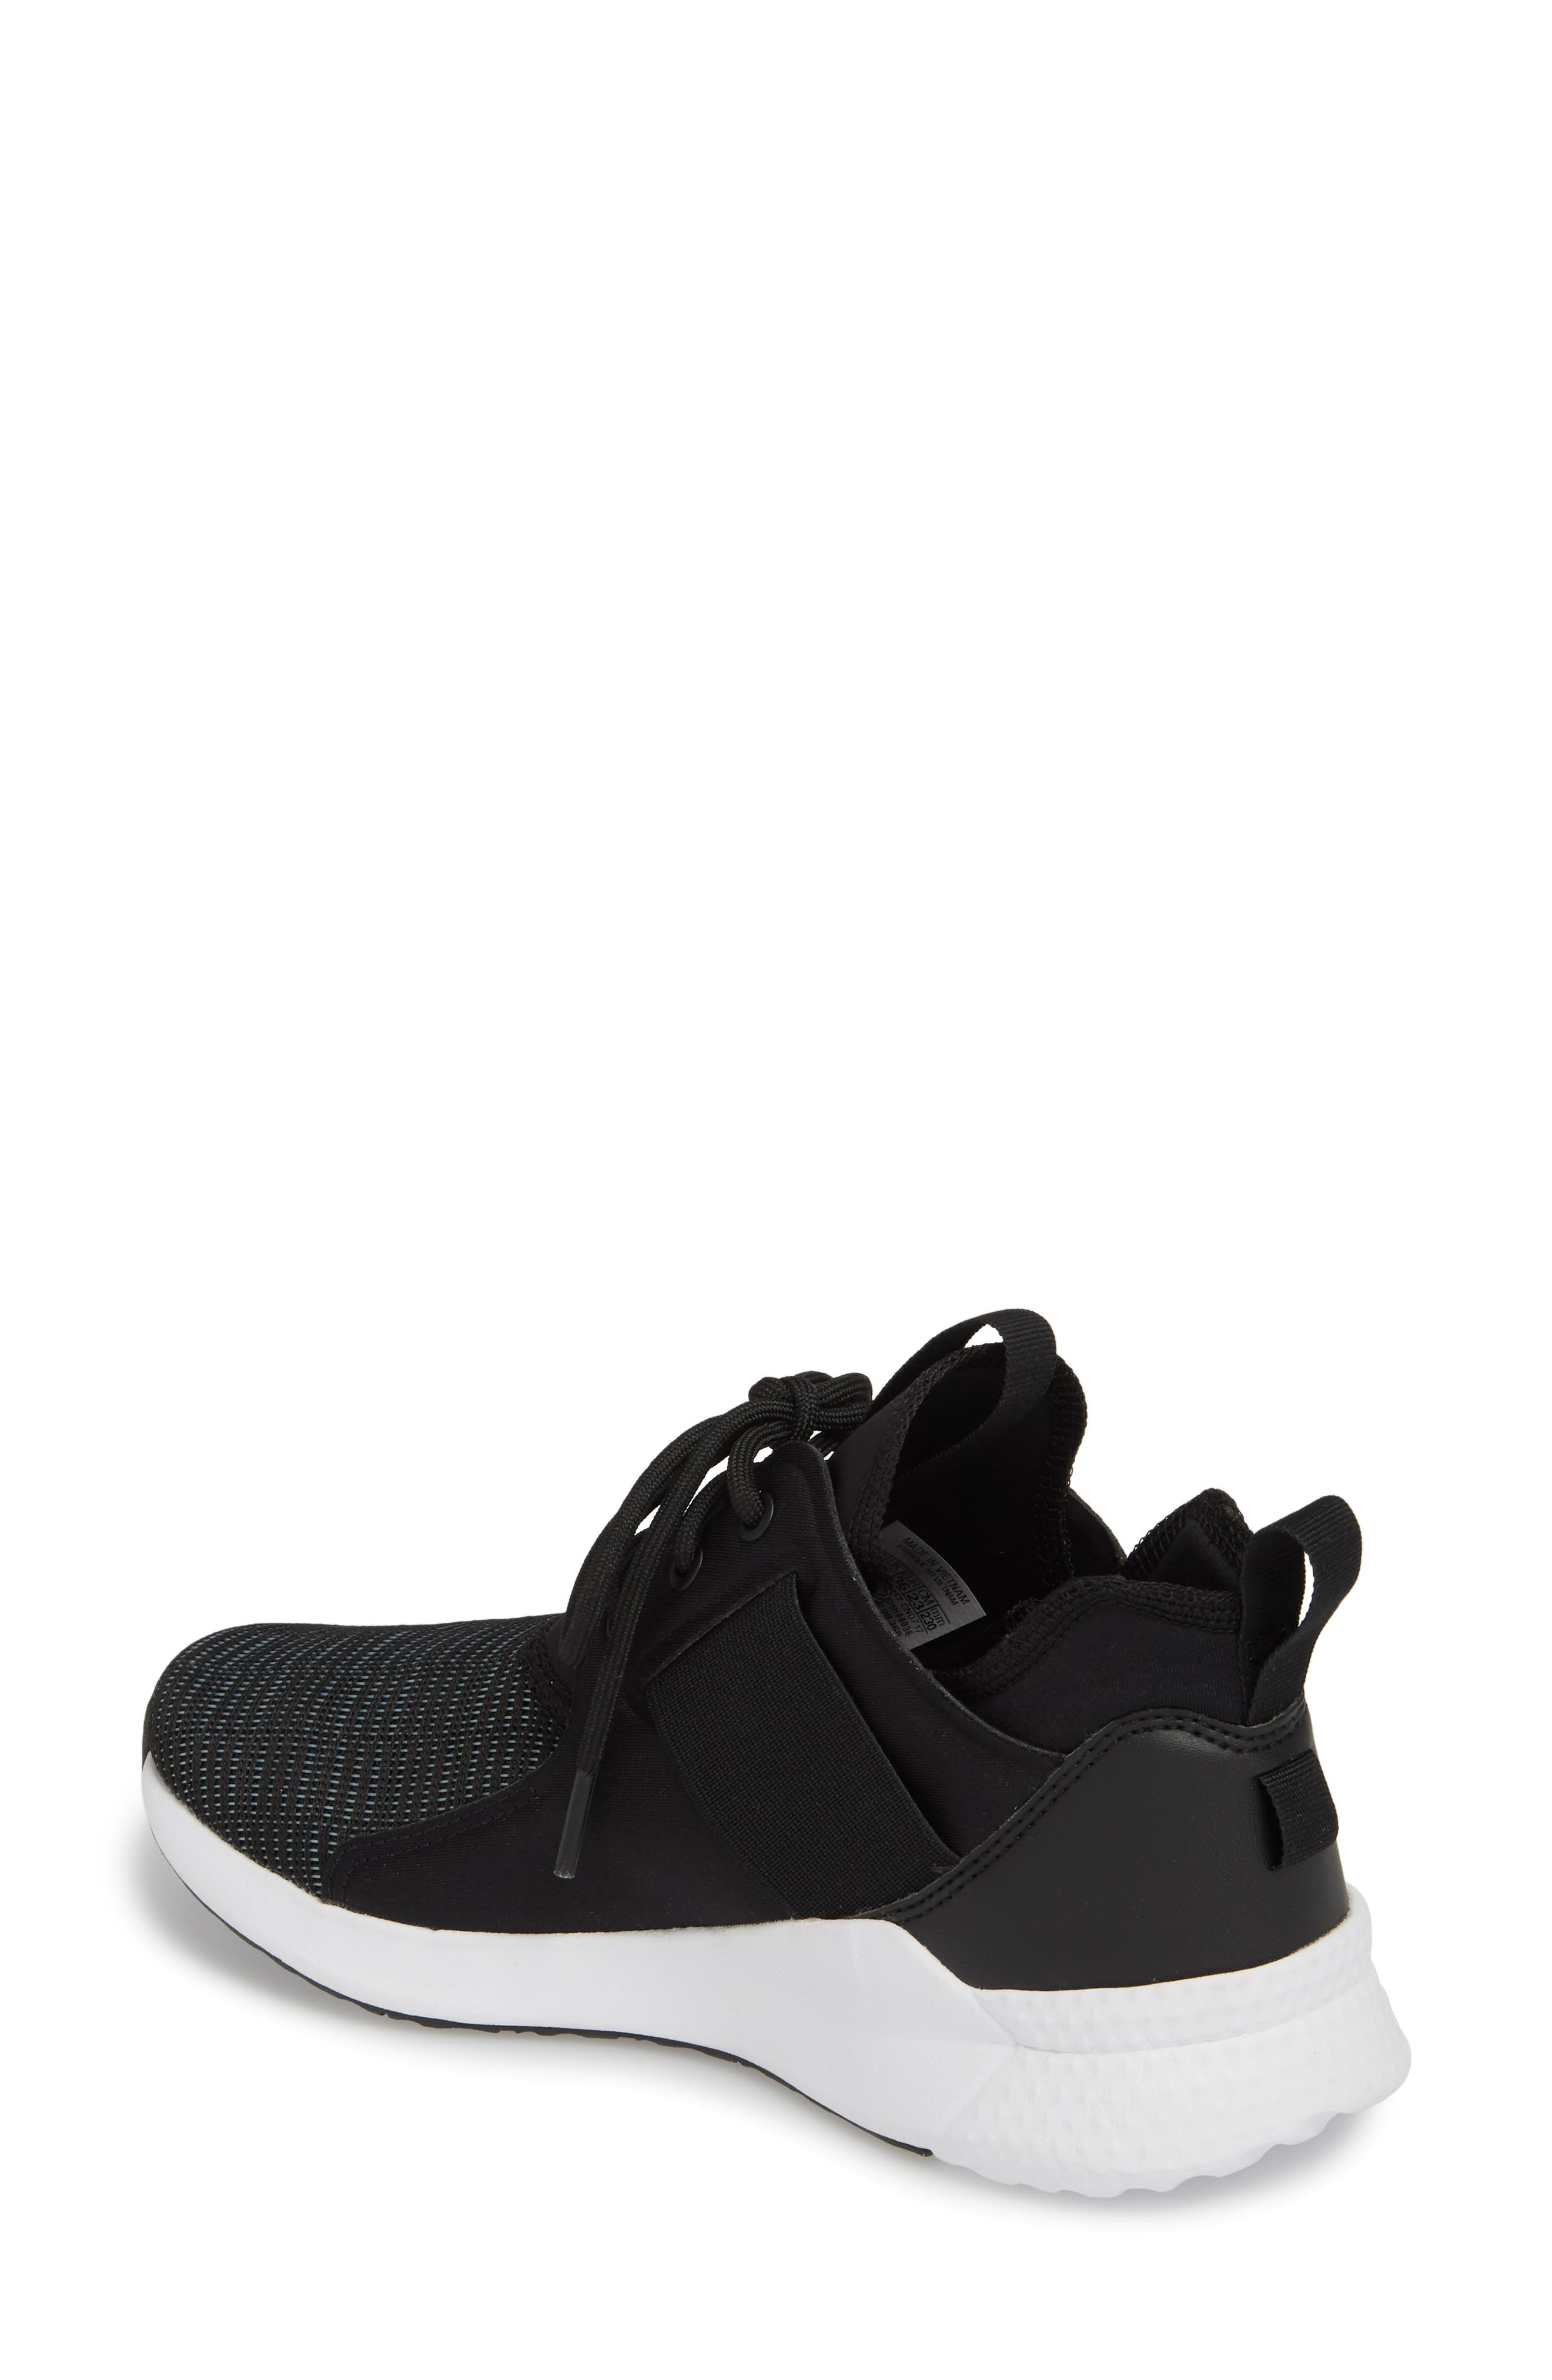 Guresu 1.0 High Top Sneaker,                             Alternate thumbnail 2, color,                             Black/ White